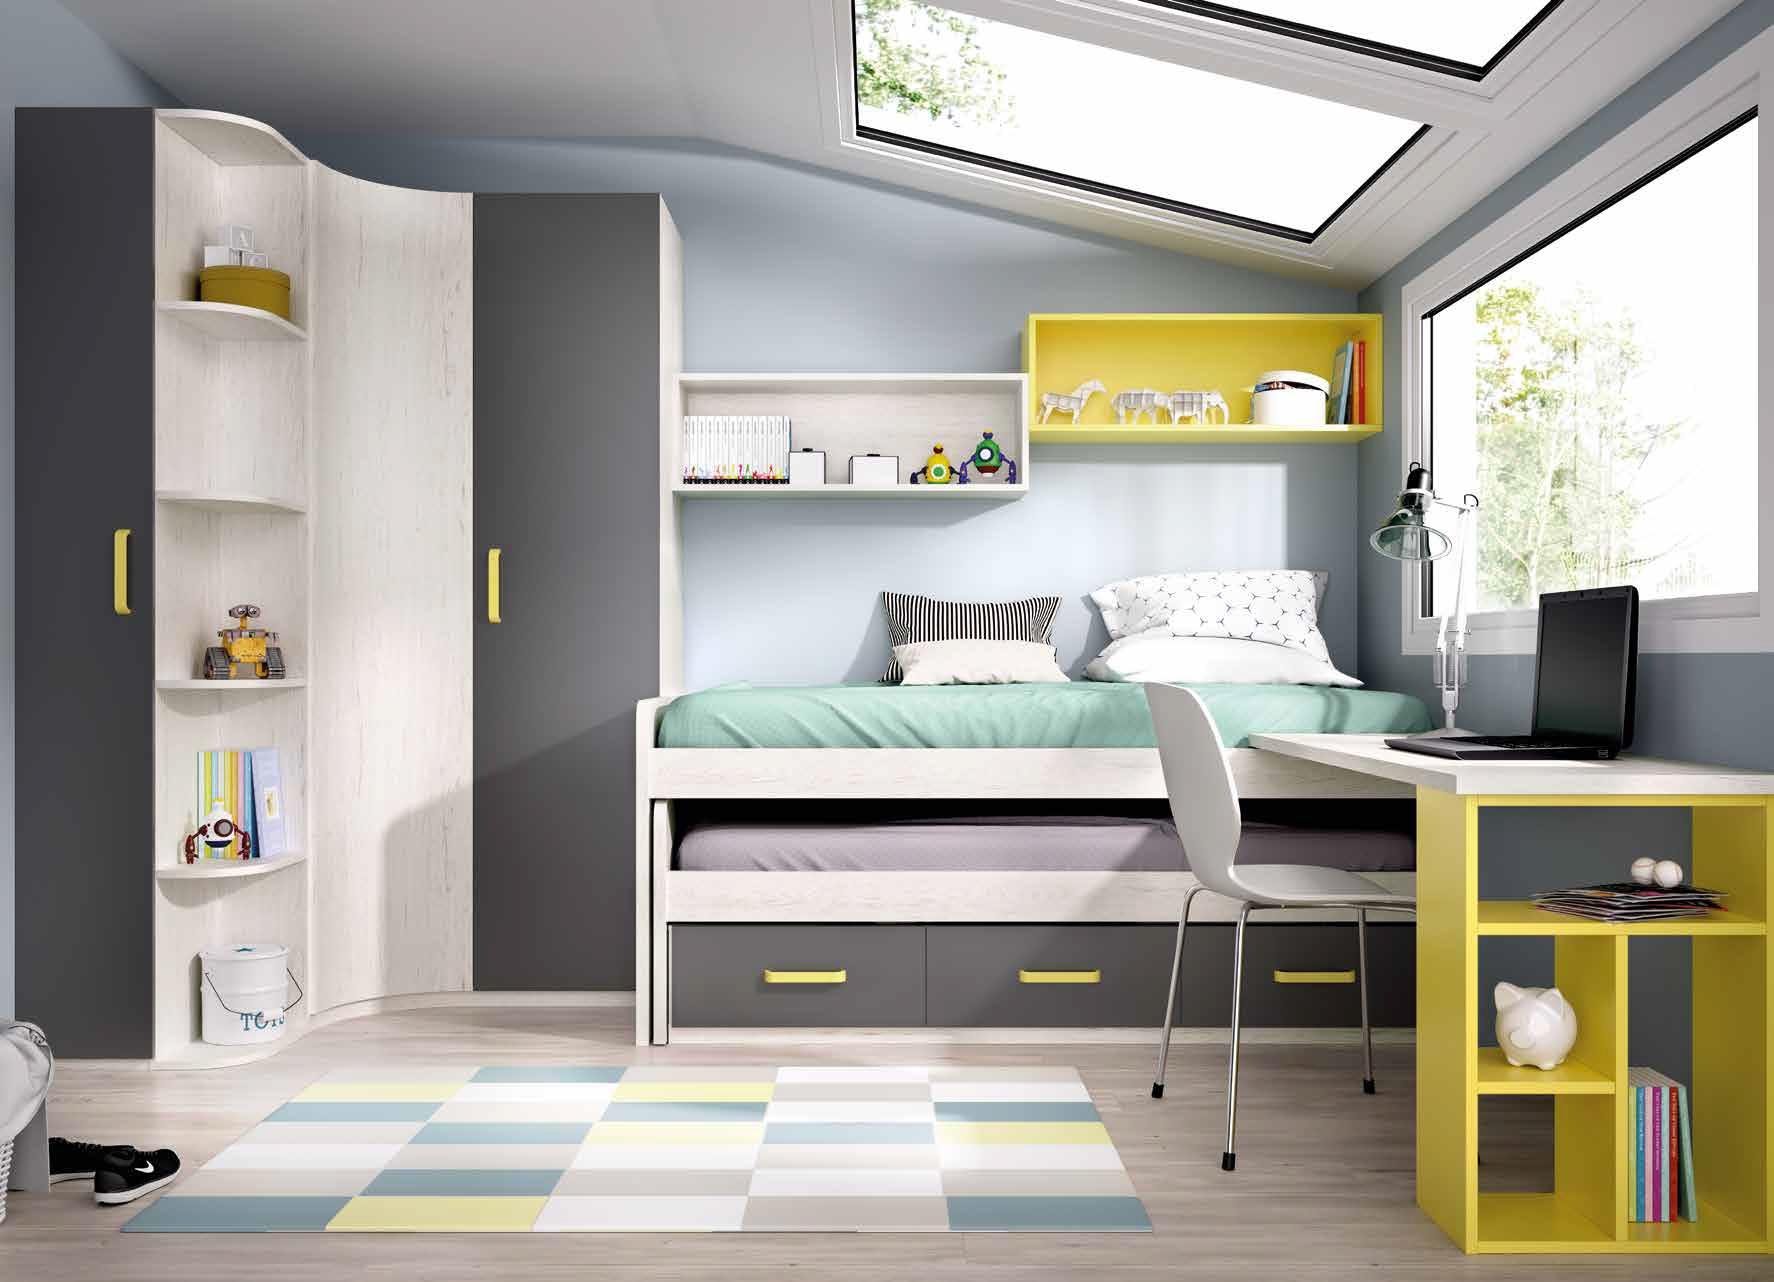 compactos-ONE-19-muebles-paco-caballero-512-5ccc174e20ca0